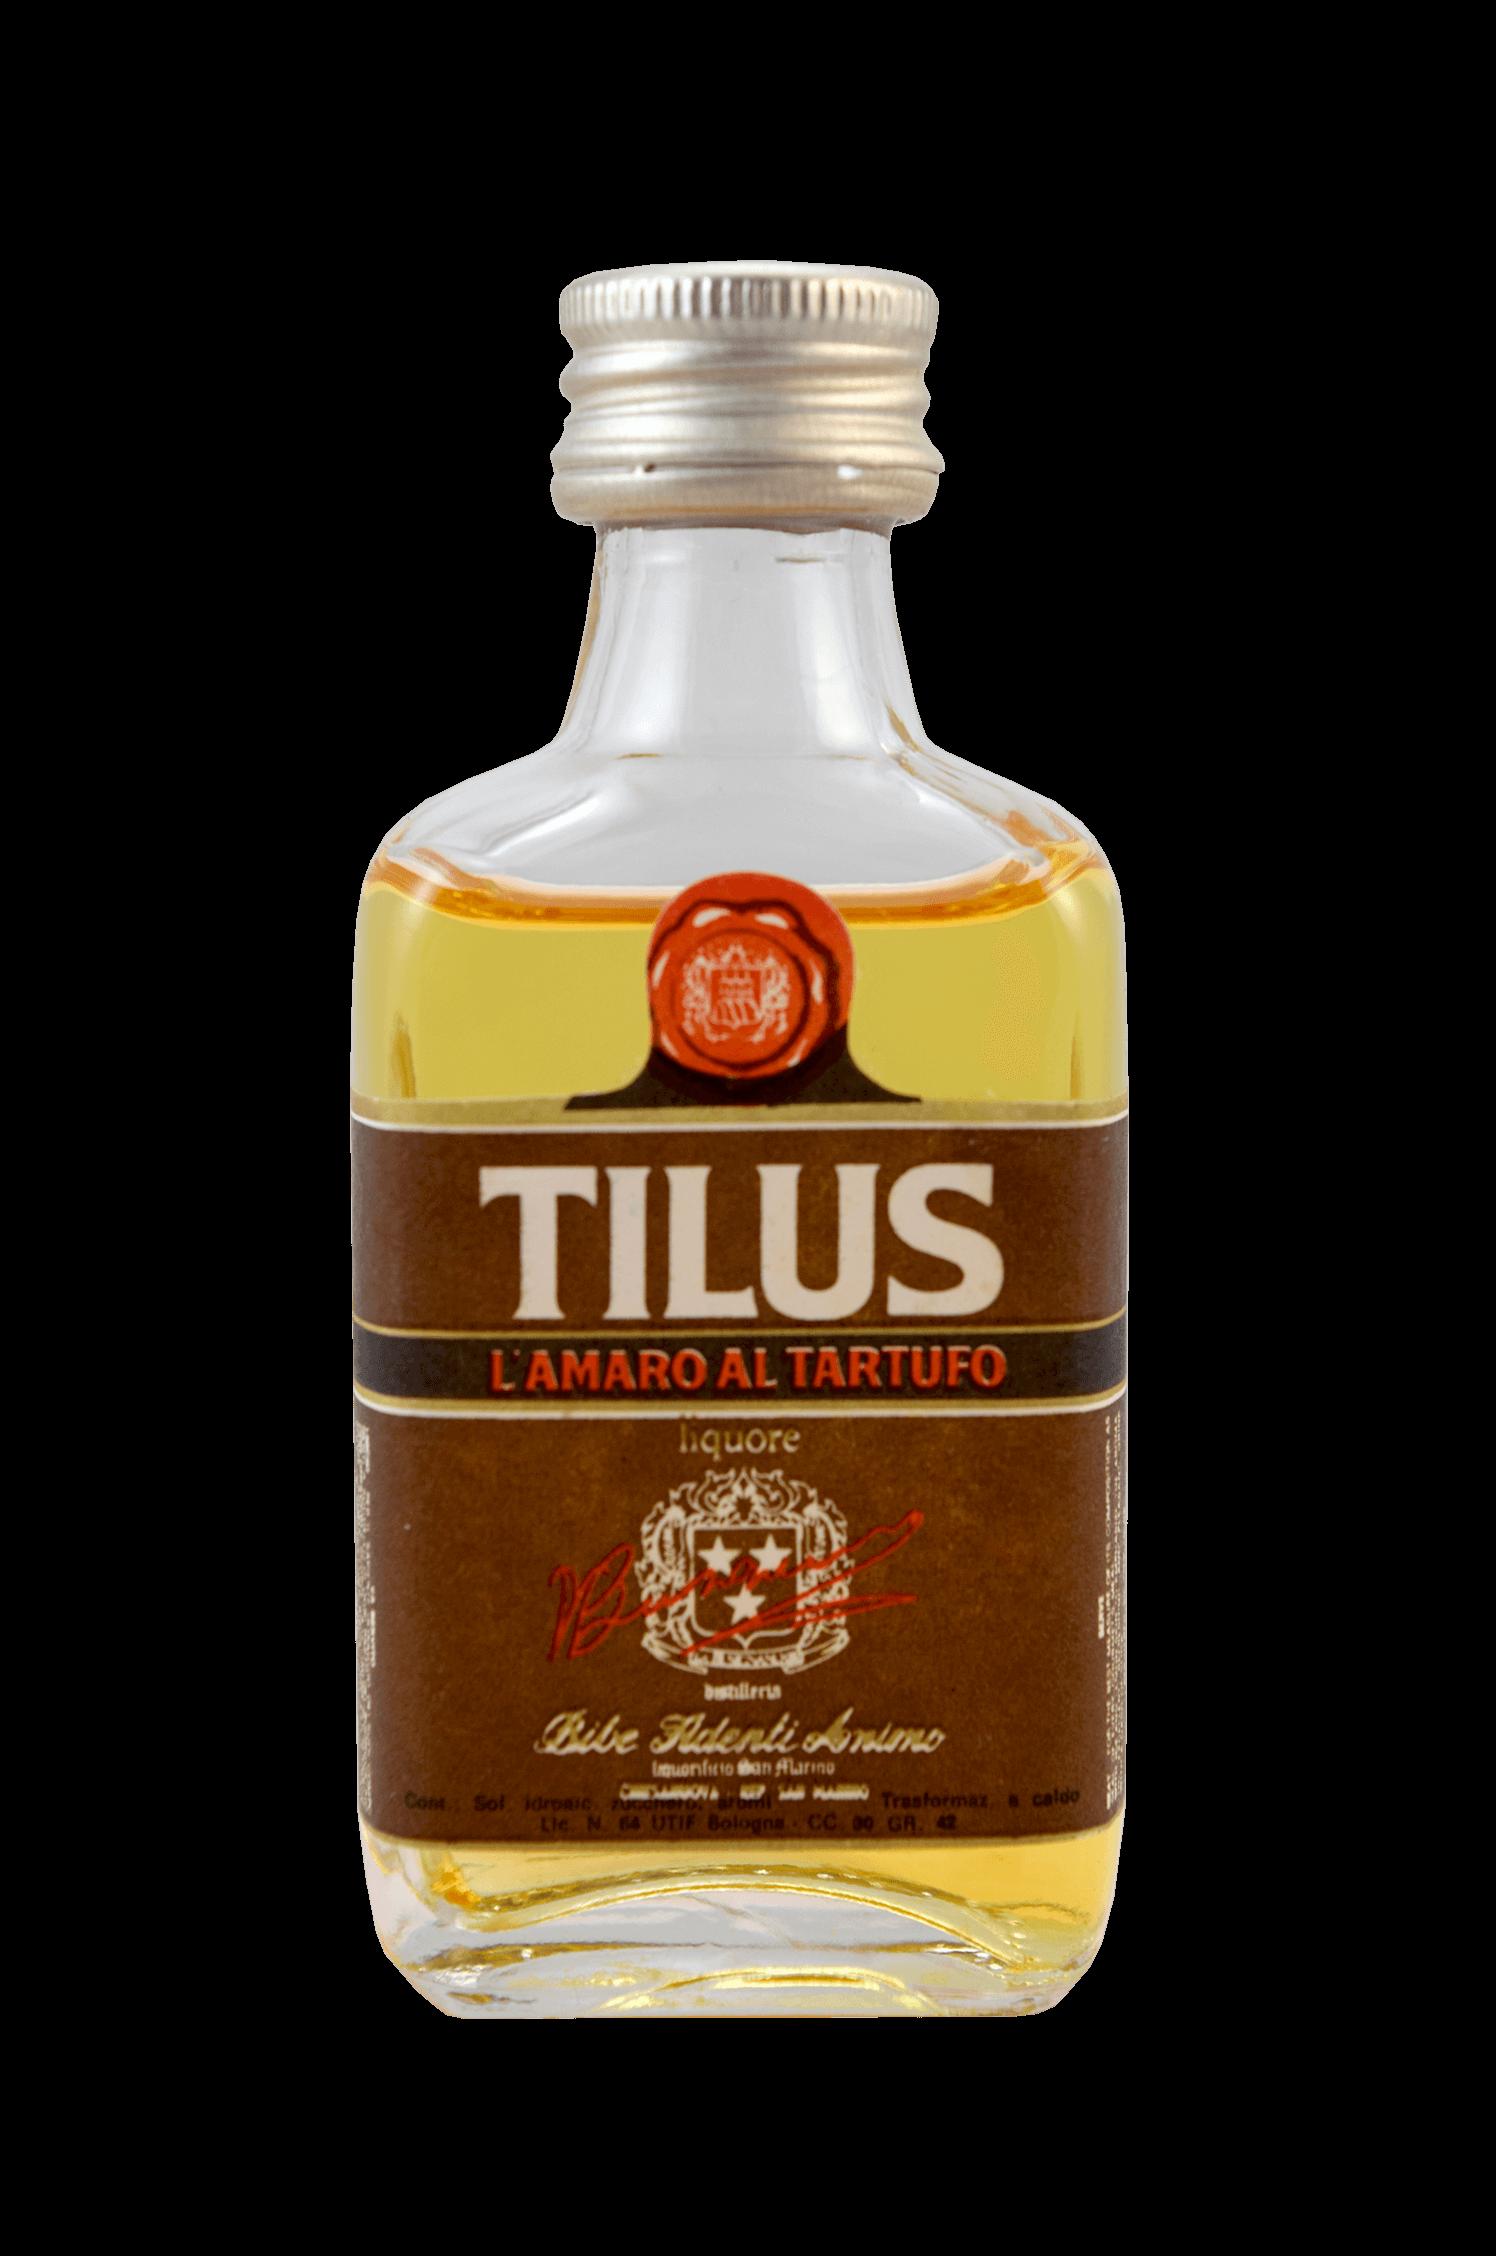 Tilus Liquore